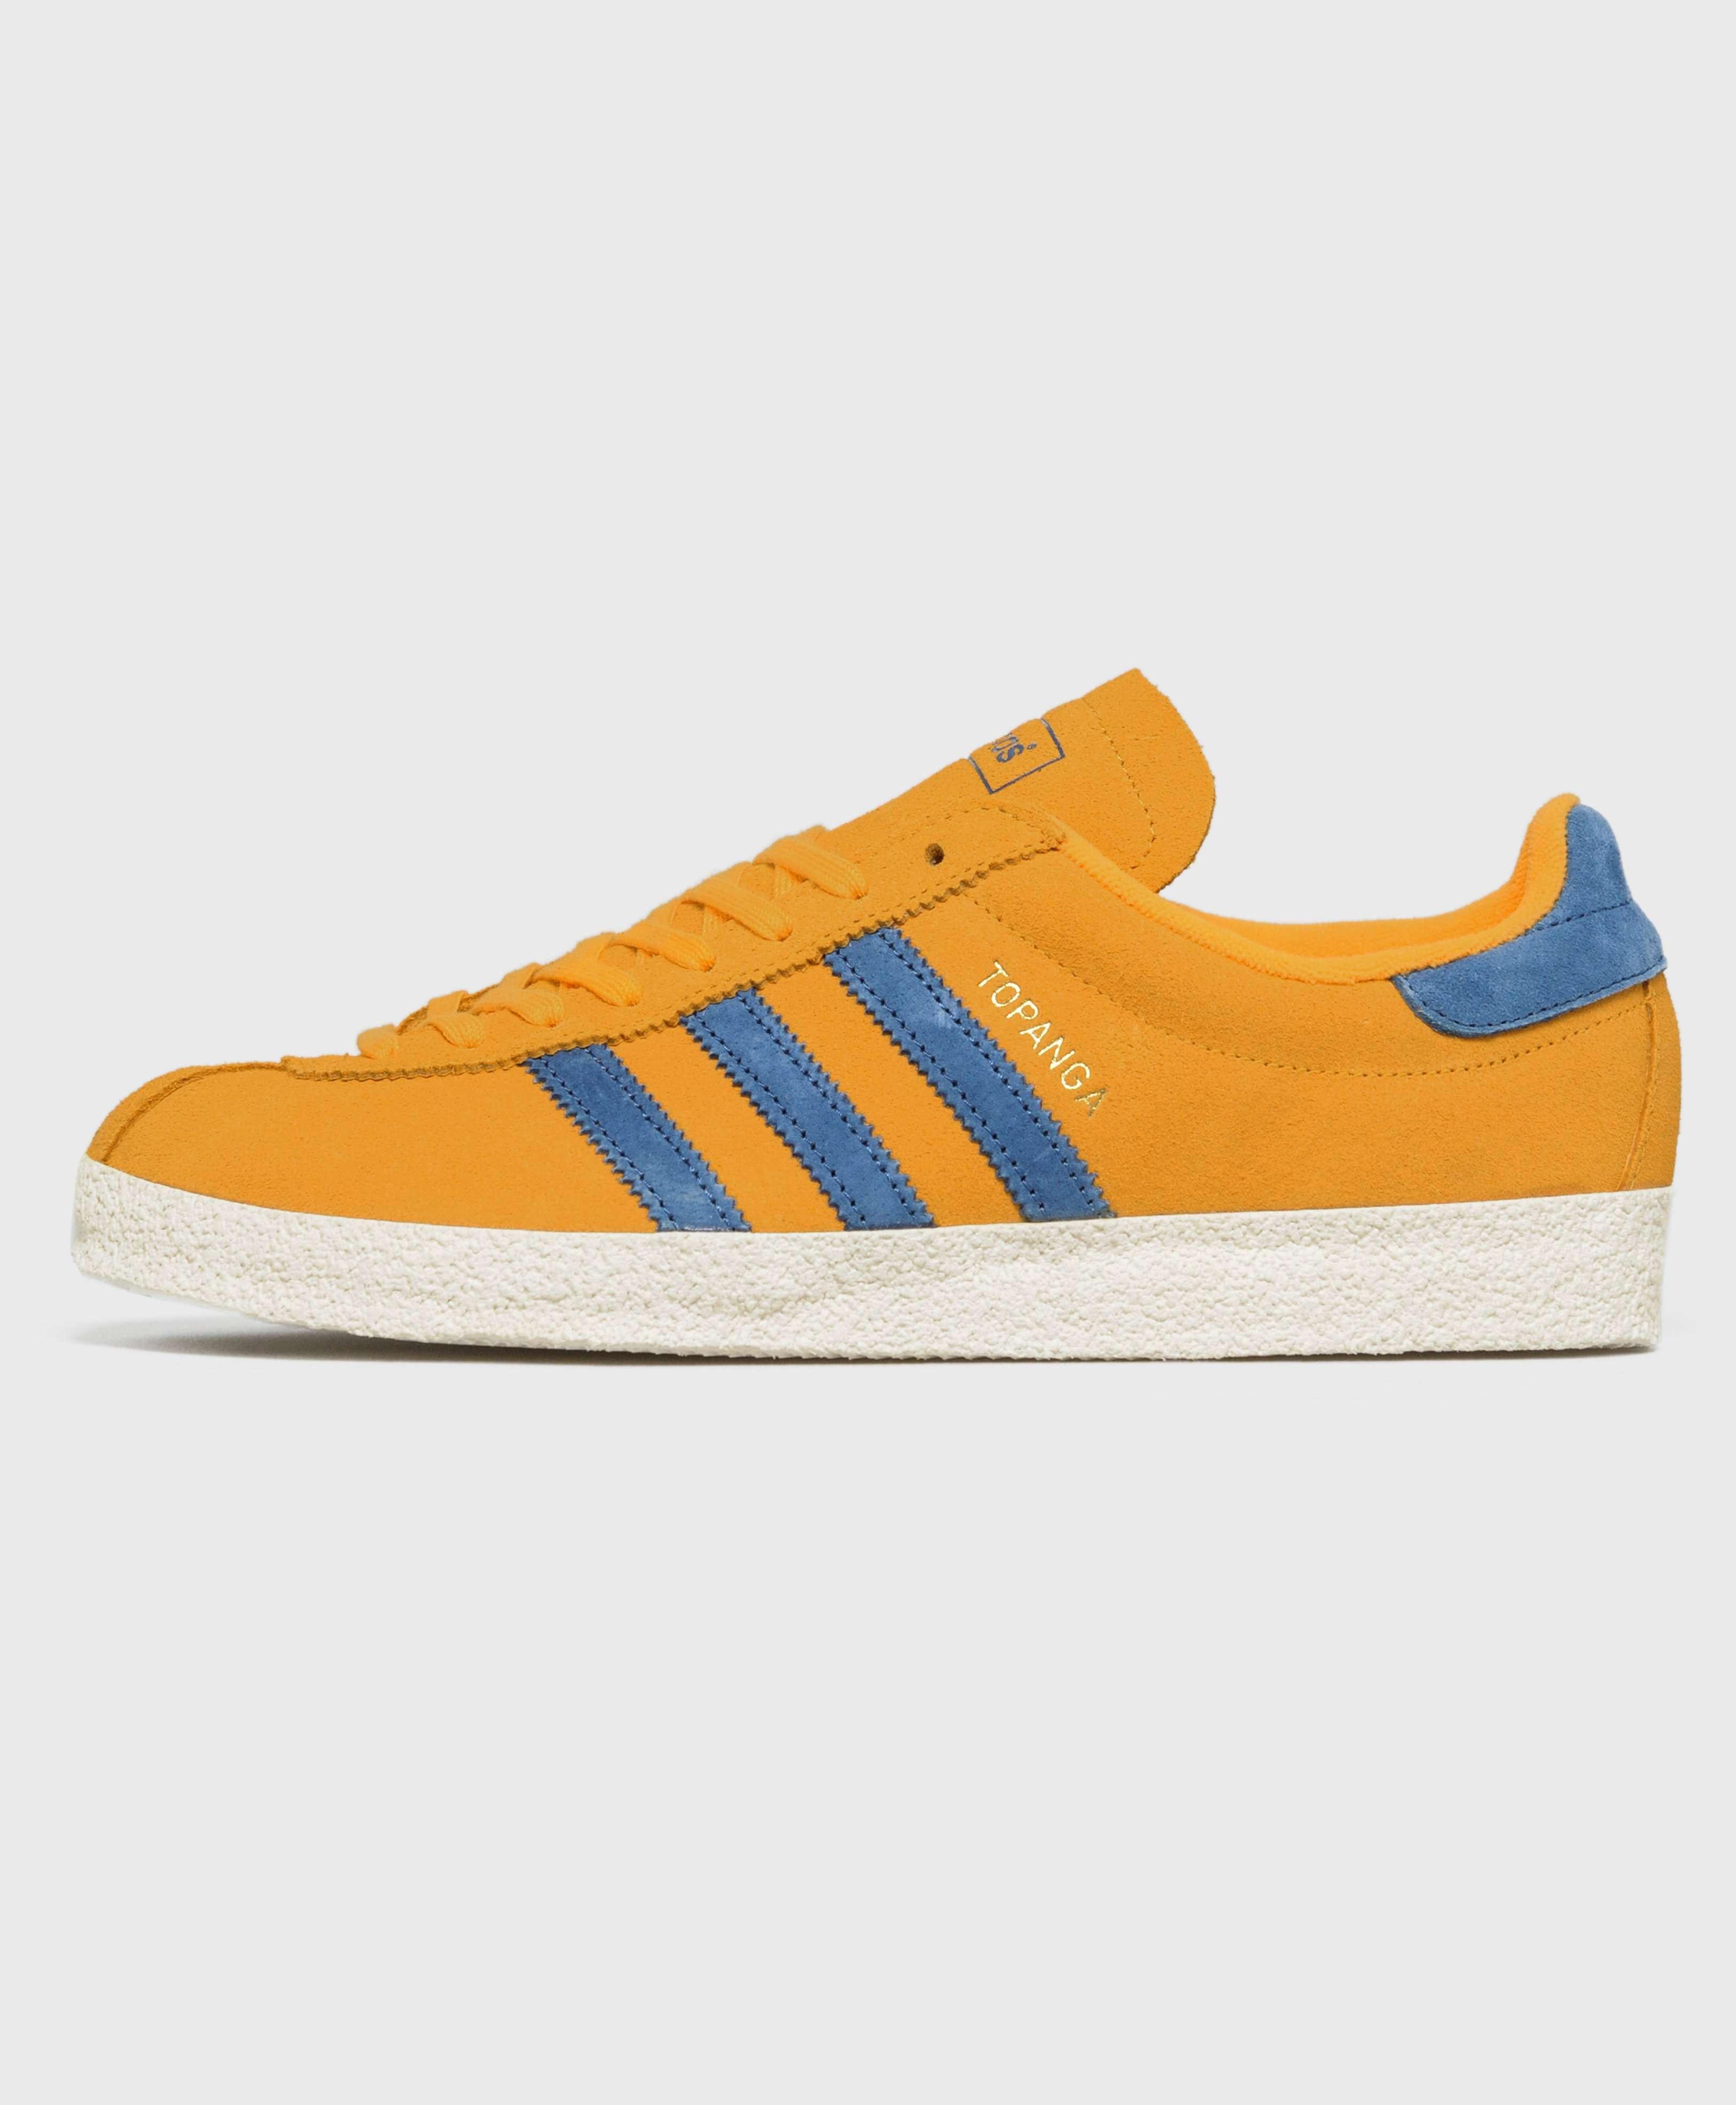 Adidas Originals Topanga Scotts hombre wear